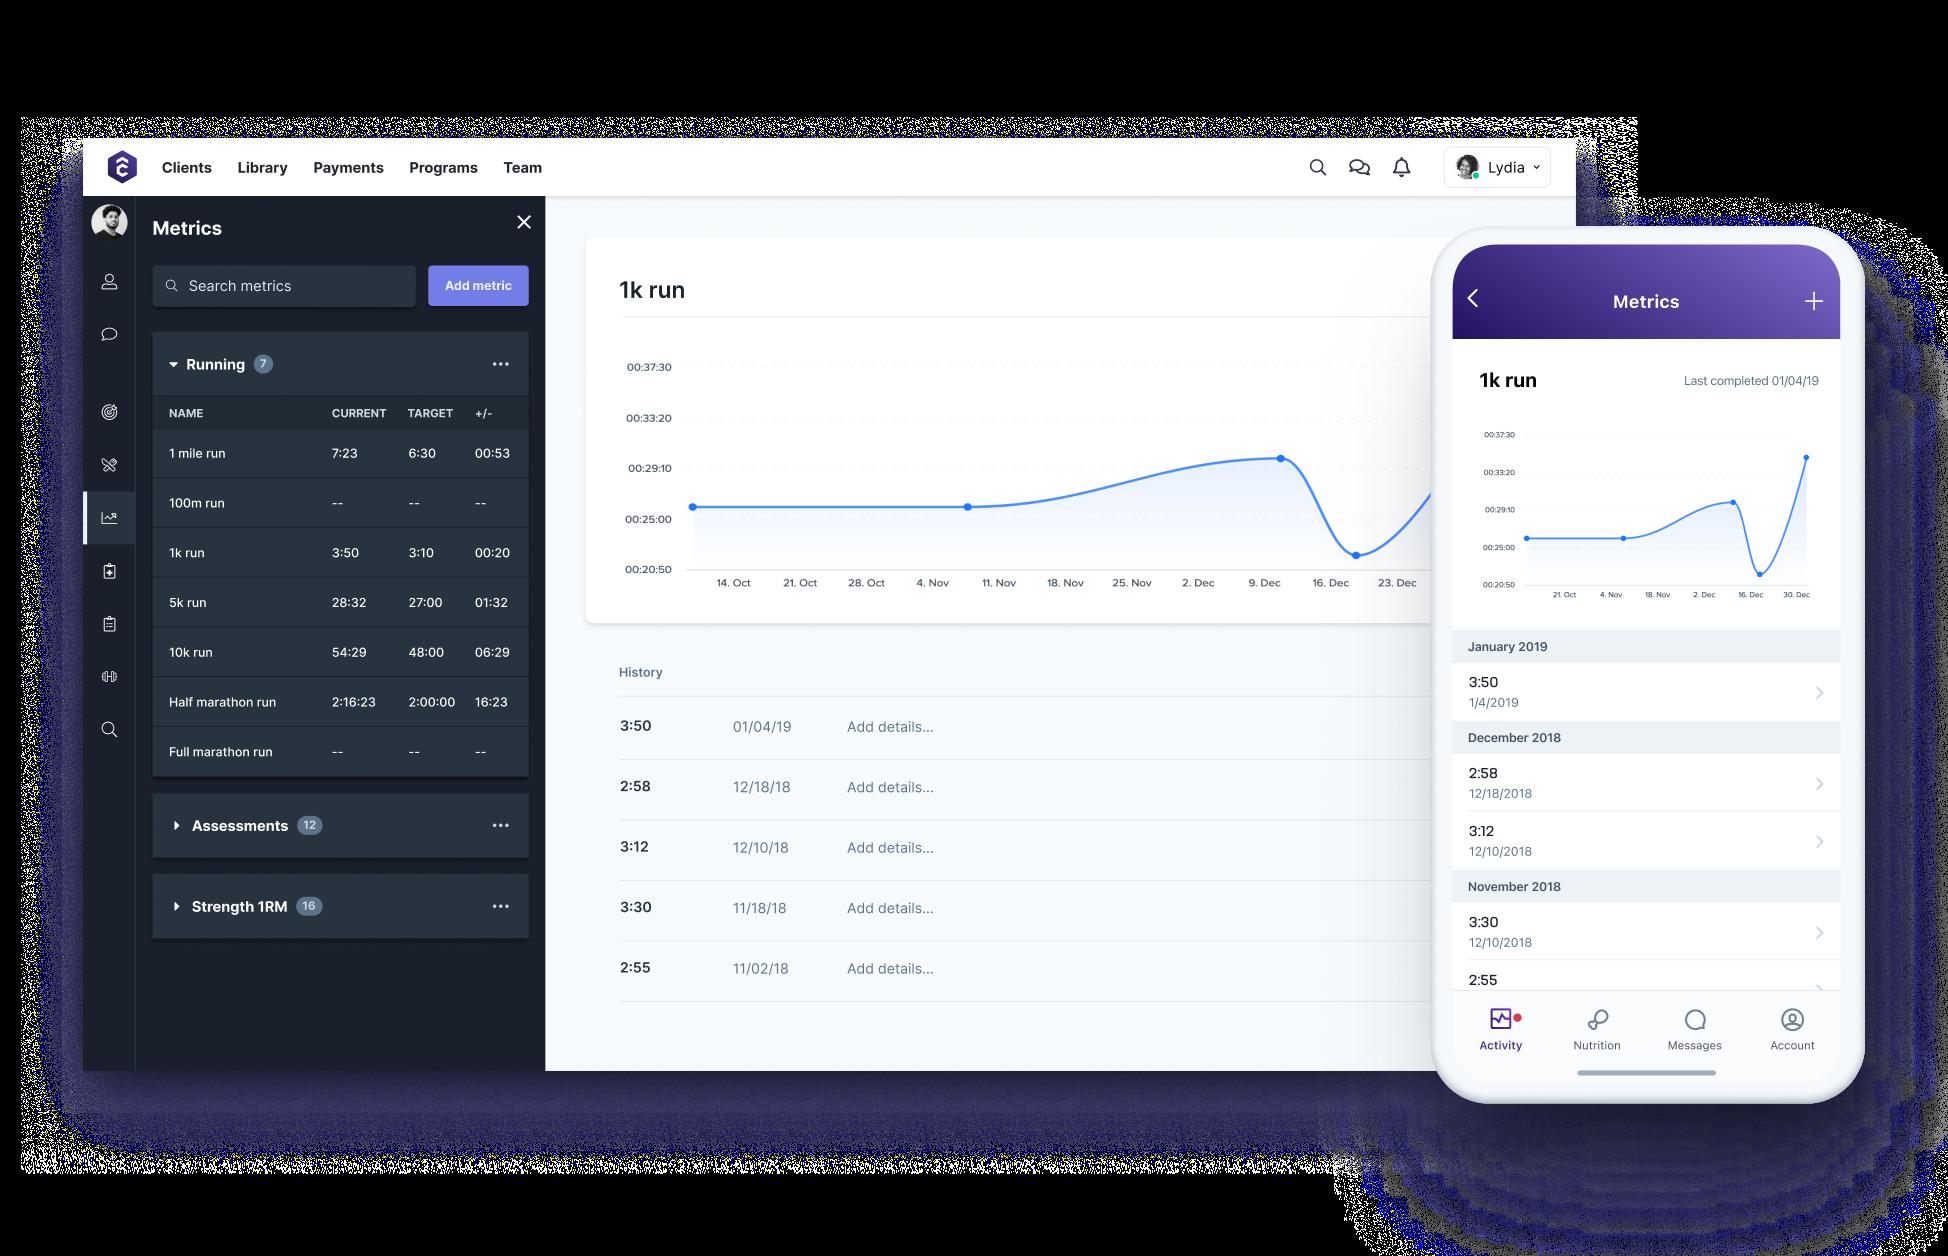 TrueCoach metrics progression tools